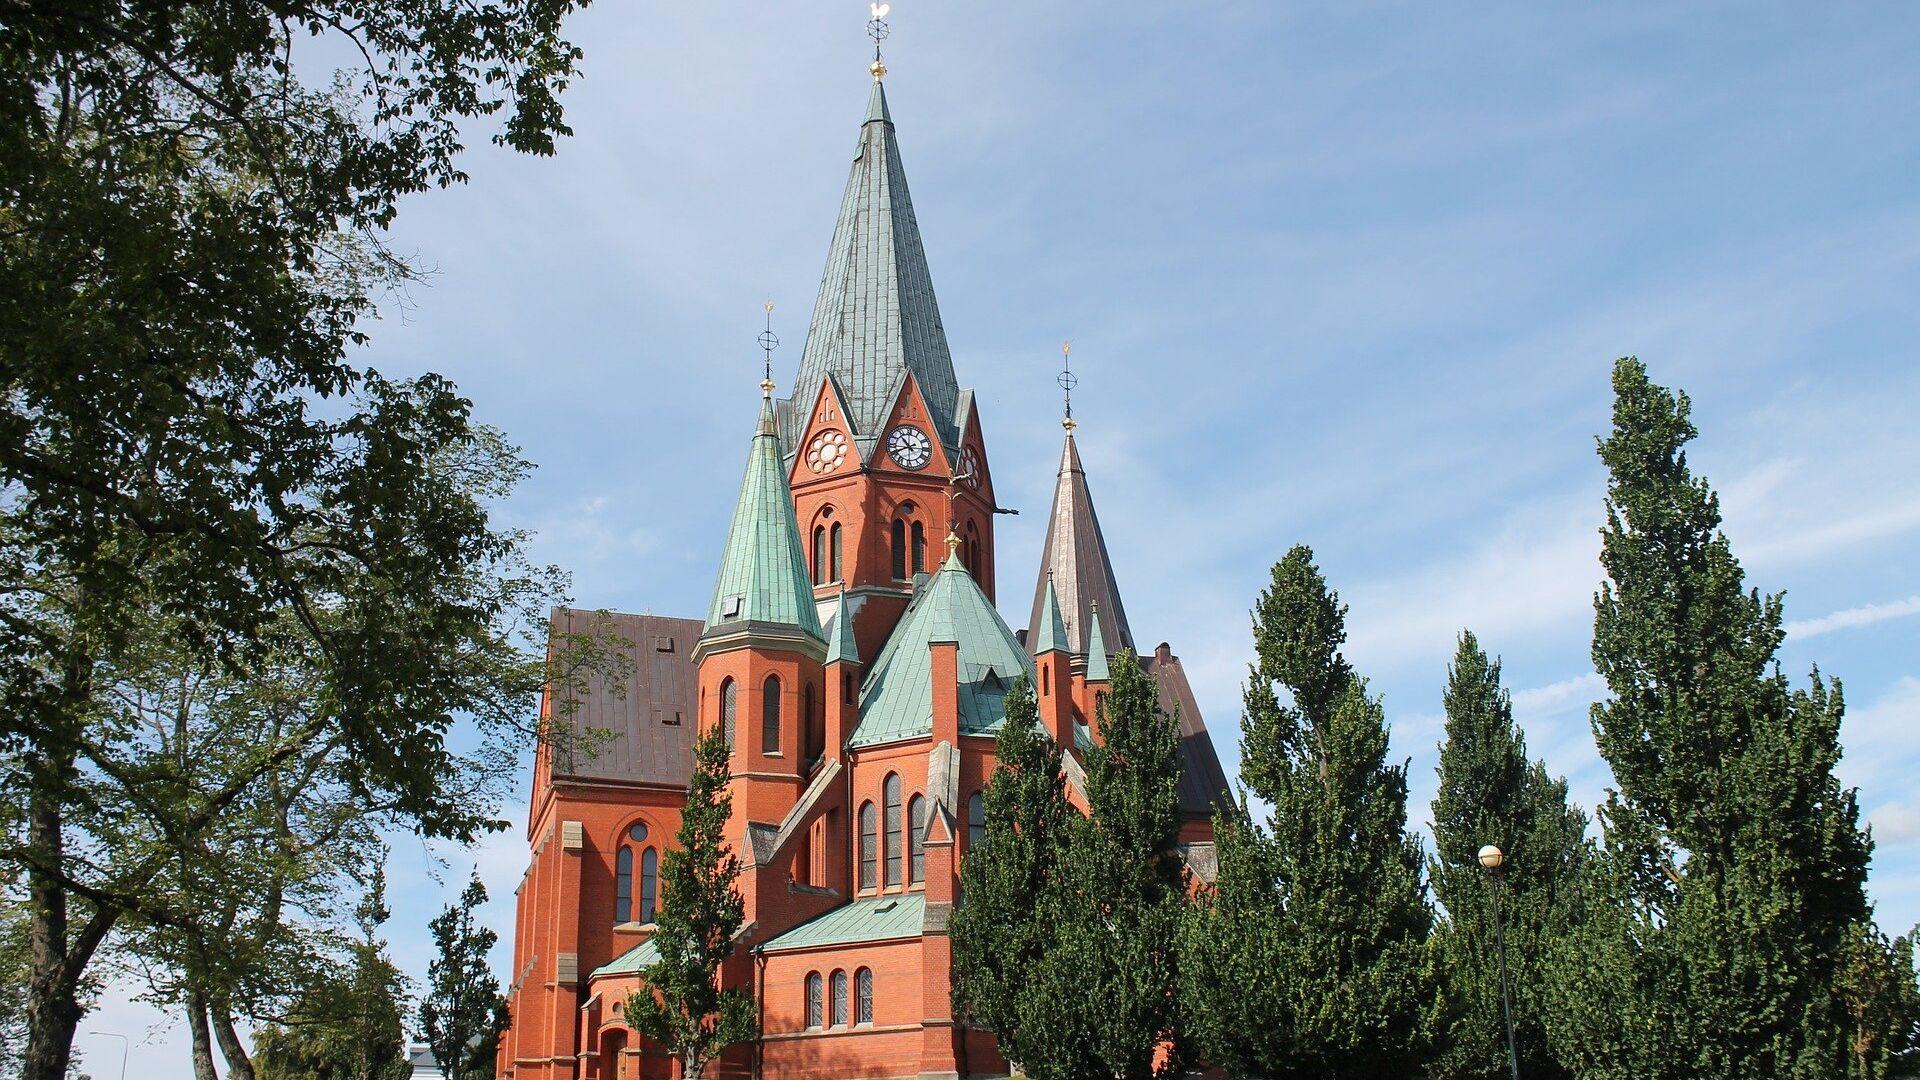 Church in Sweden - Sputnik International, 1920, 16.09.2021